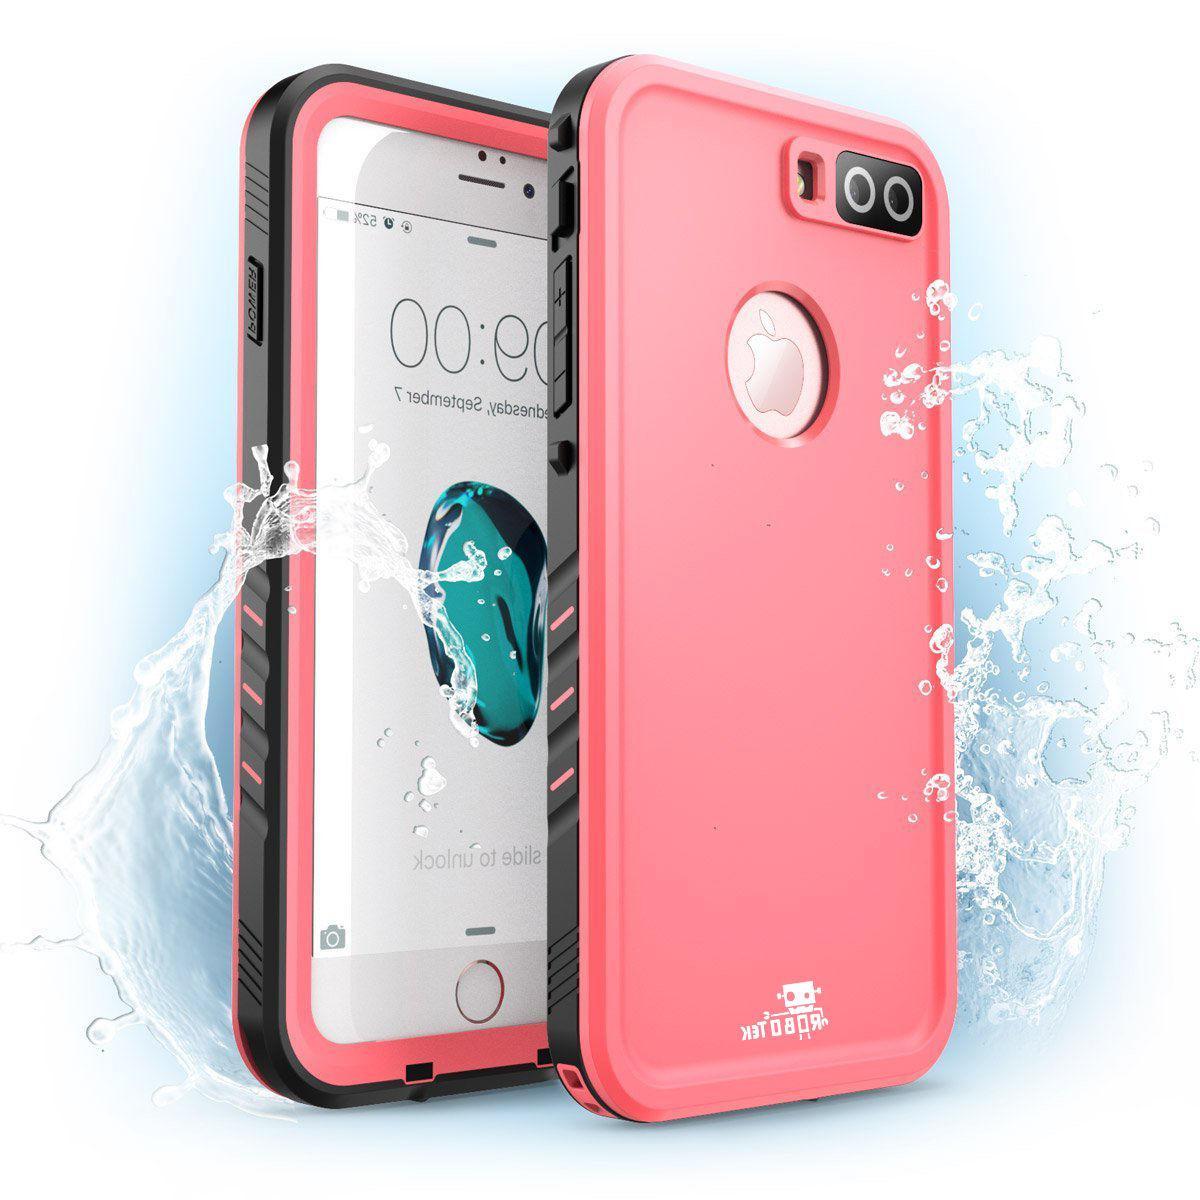 Robotek iPhone 8 Plus Waterproof Full-body Case with Built-i